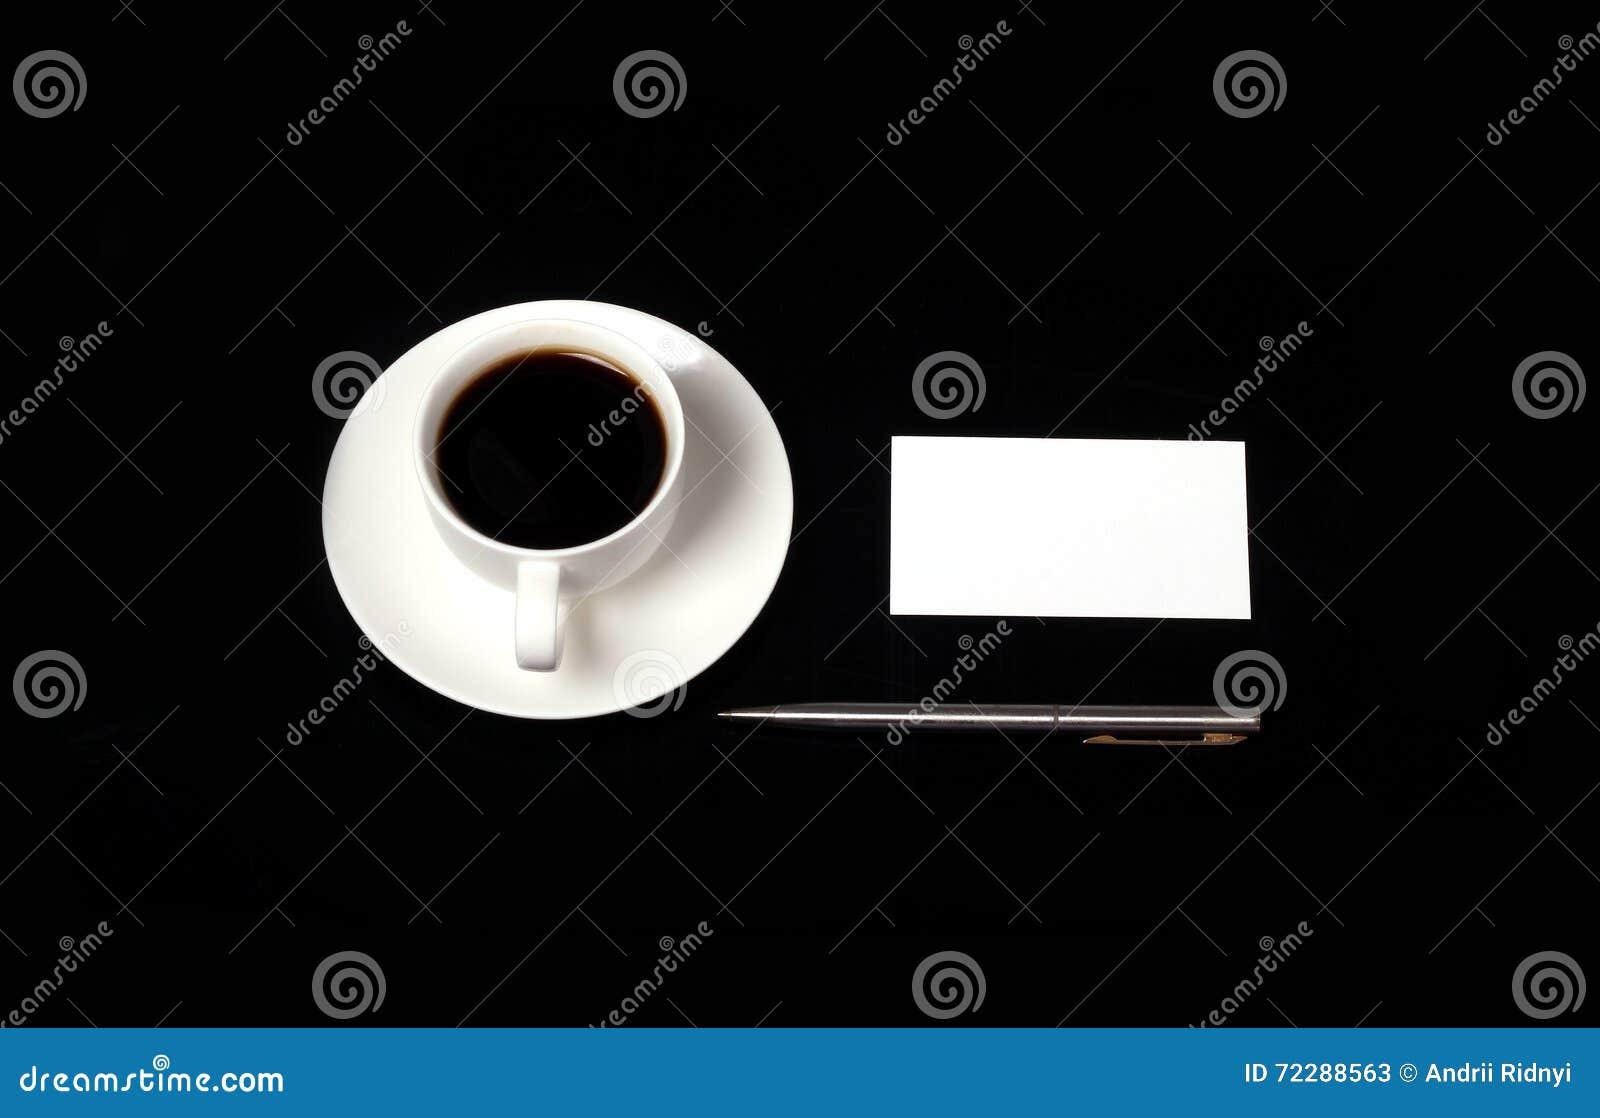 Download Визитная карточка на черной таблице Стоковое Изображение - изображение насчитывающей корпоративно, стог: 72288563